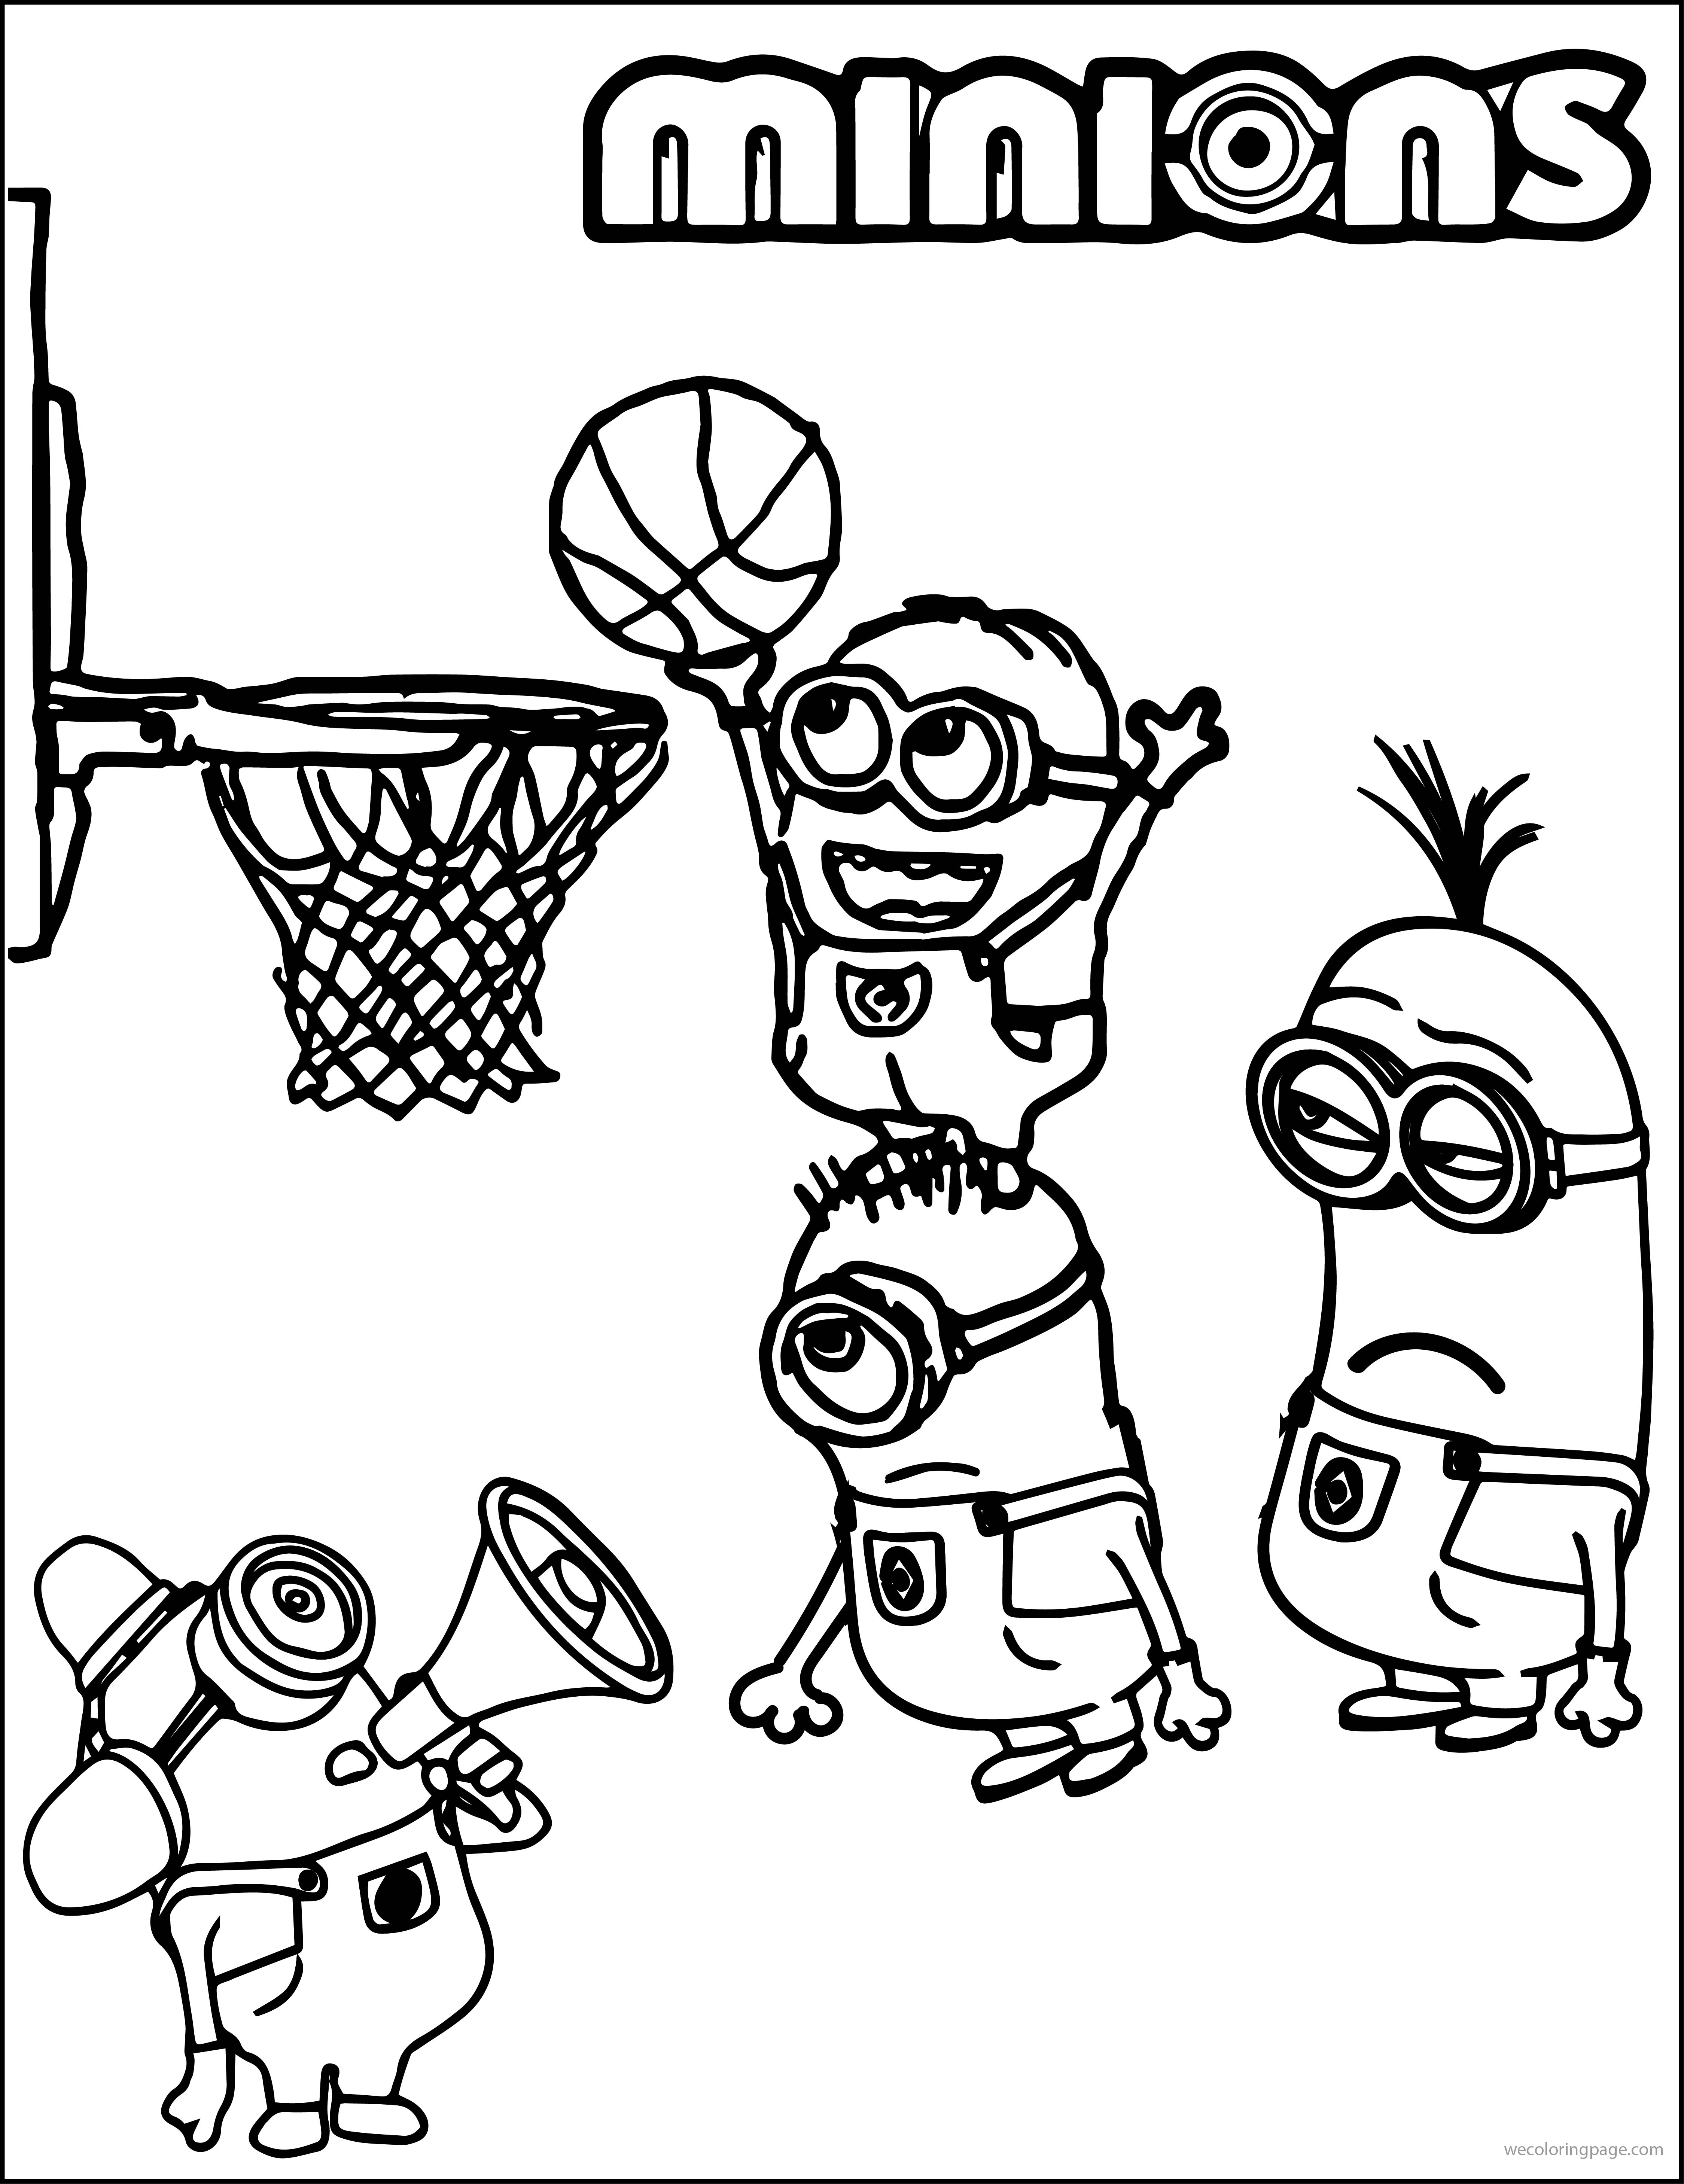 4499x5835 Amazing Toronto Raptors Logo Coloring Page Pics Photos Basketball